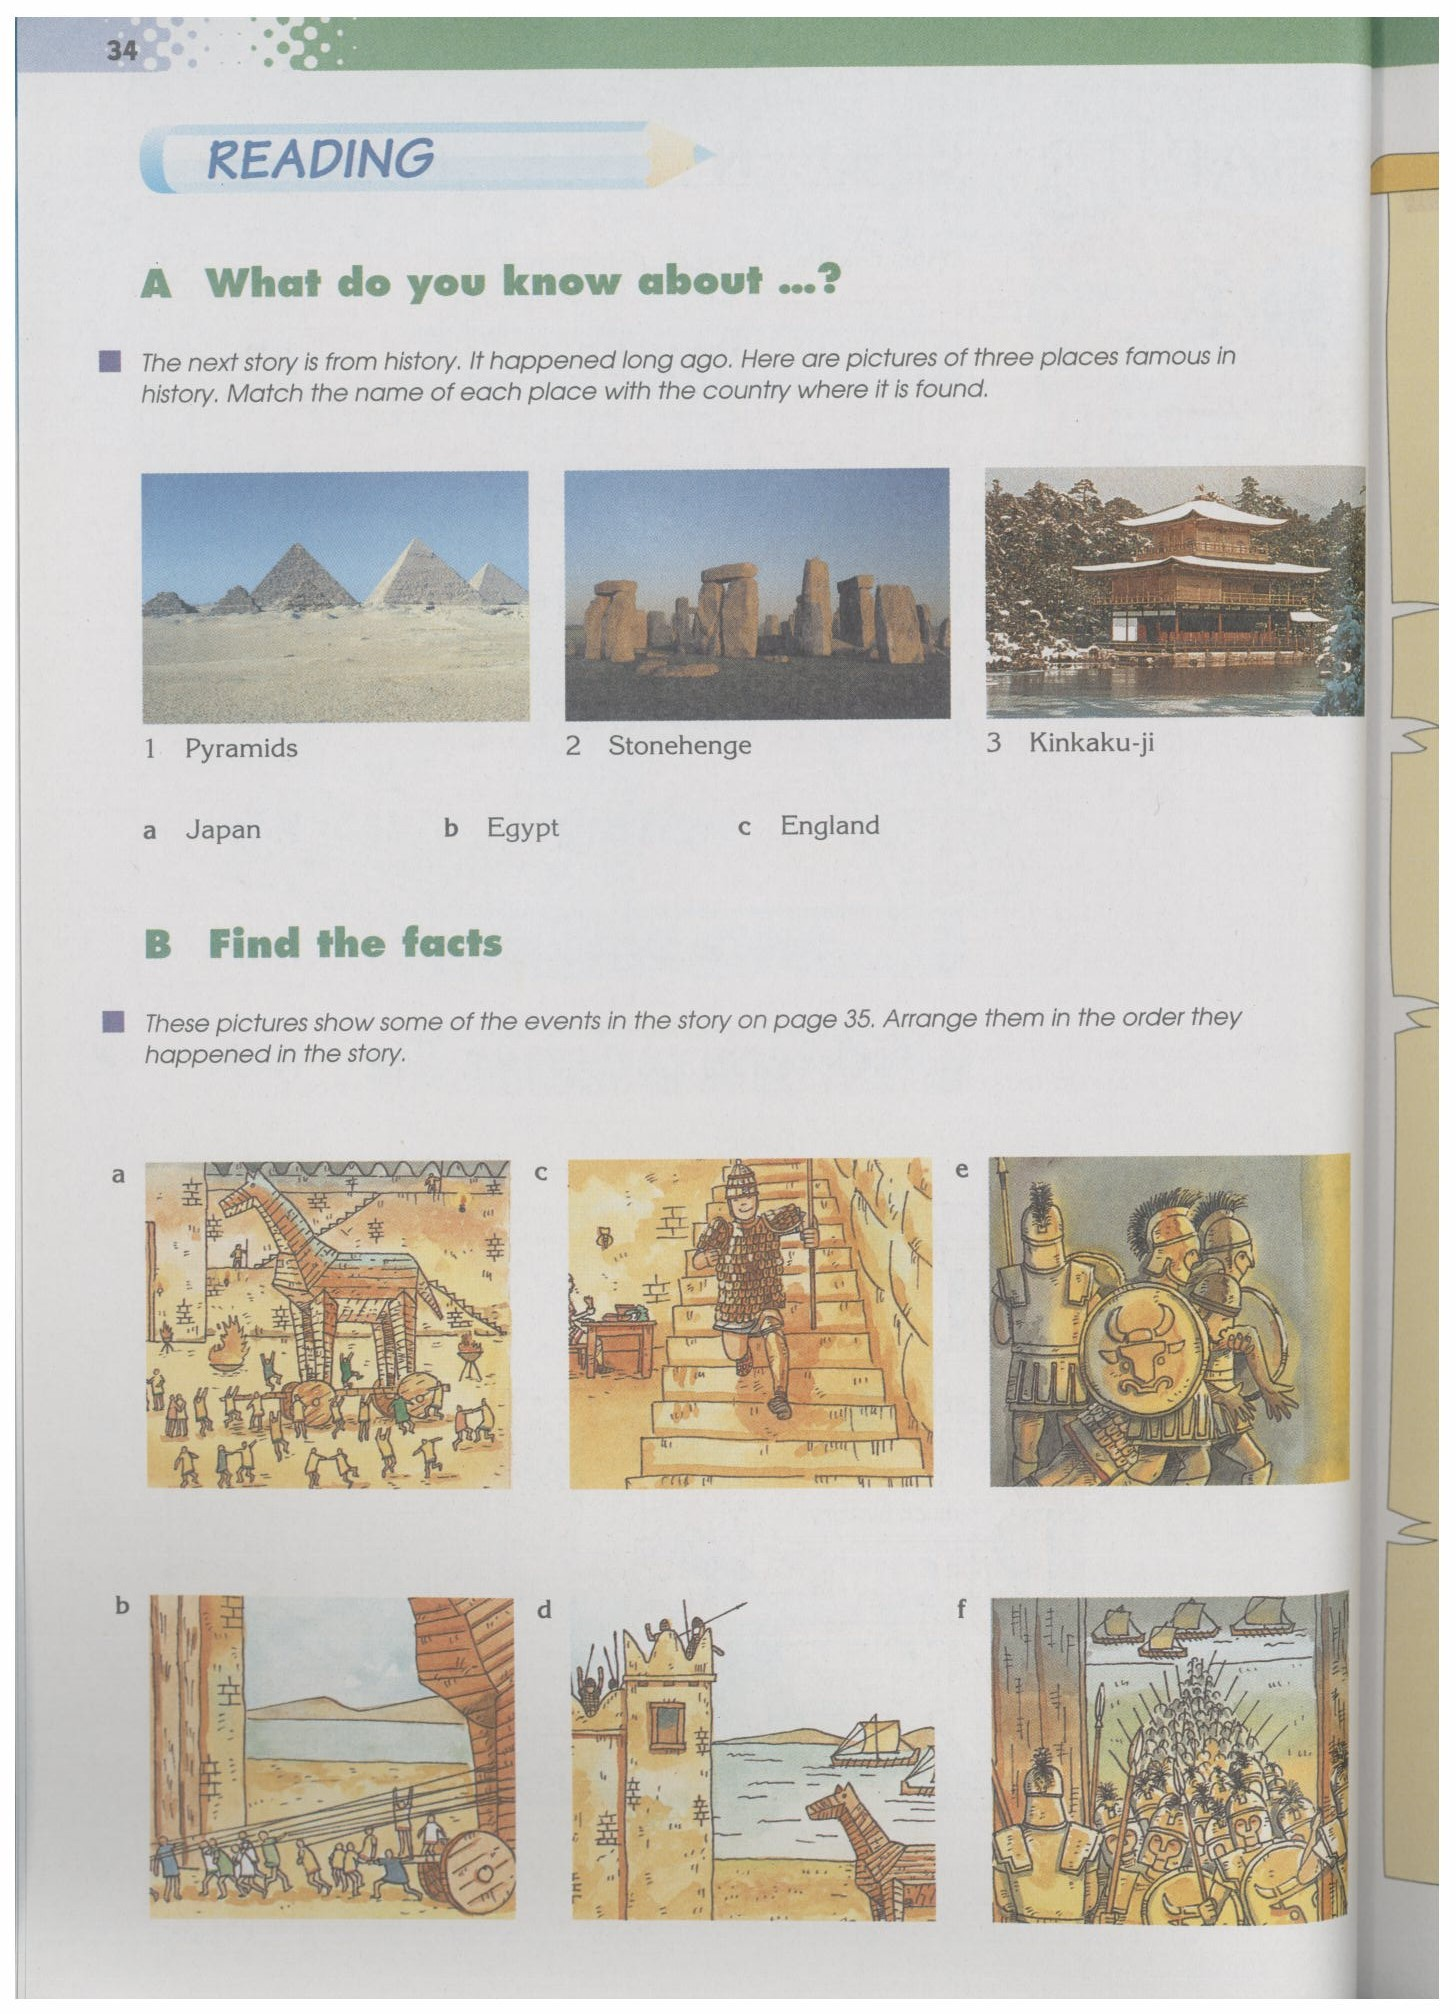 沈阳版牛津英语9A教材Chapter3-Reading